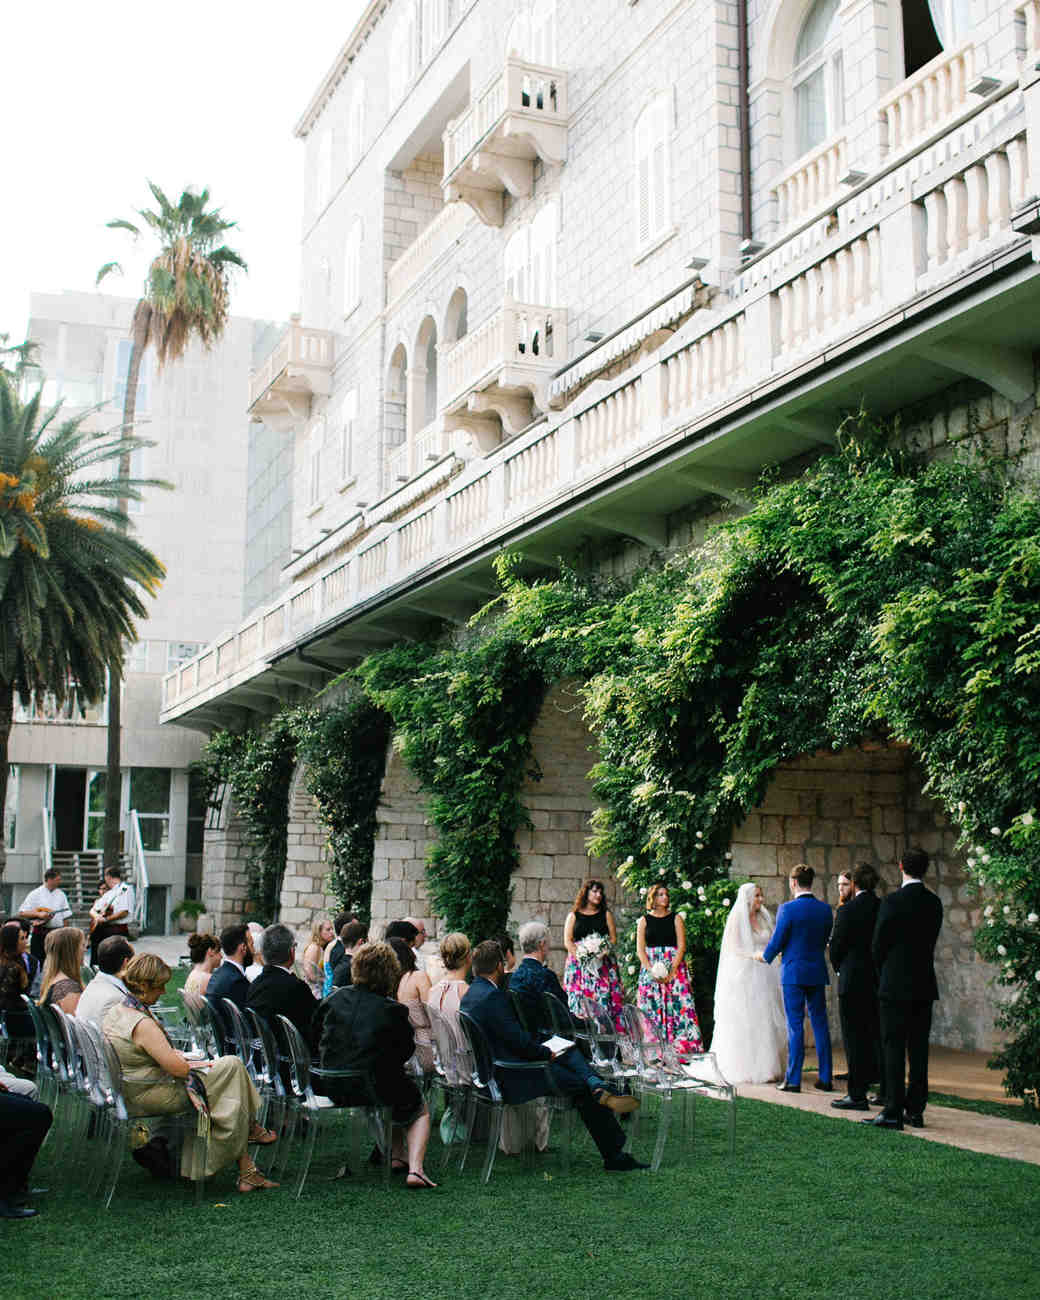 melissa-mike-wedding-ceremony-0160-s112764-0316.jpg